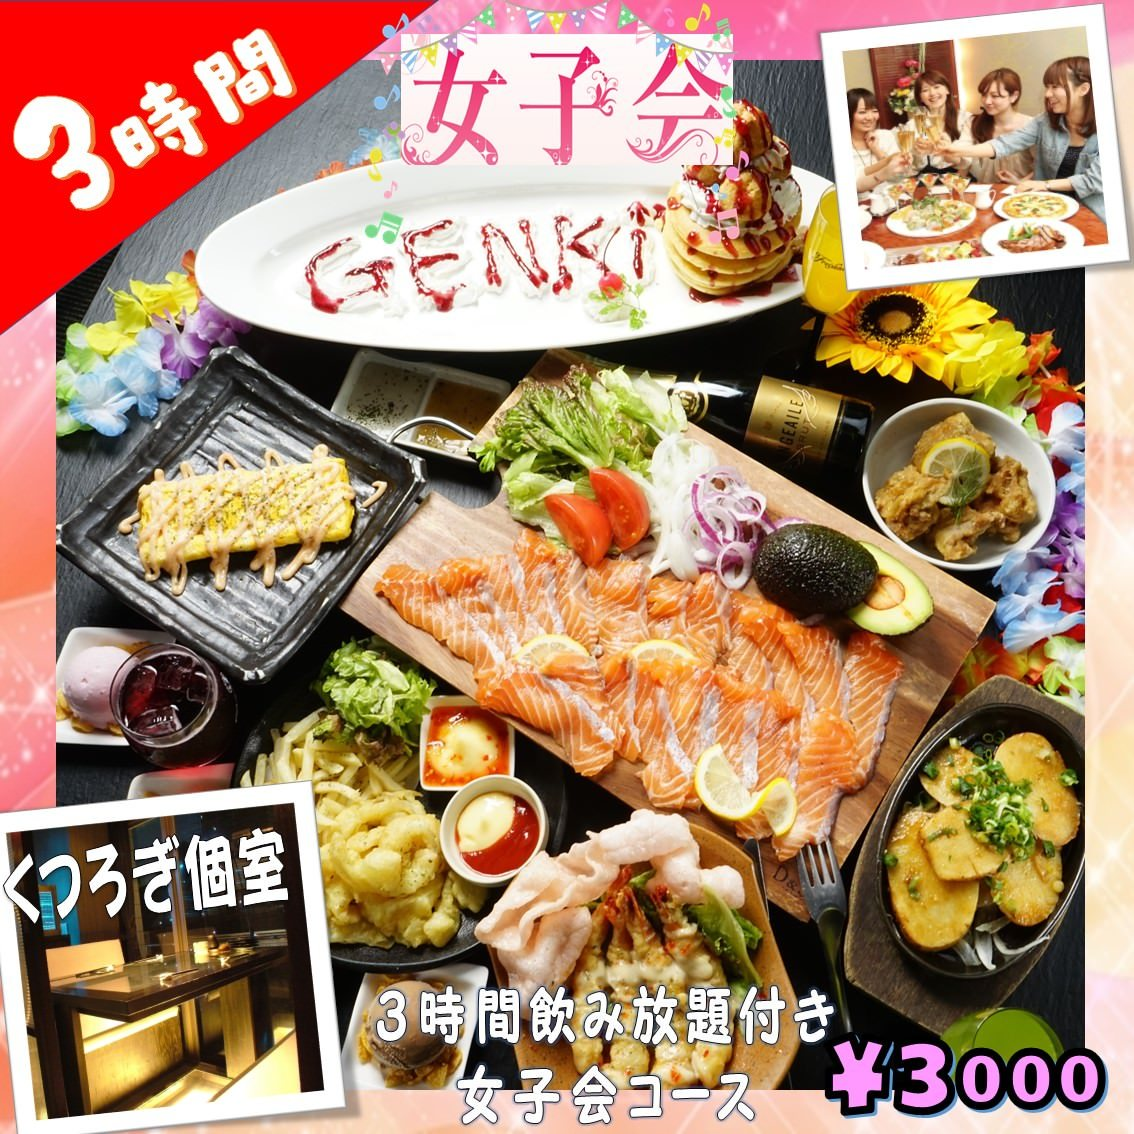 SNS映えするサーモンプレートやデザート付女子会コースが登場!